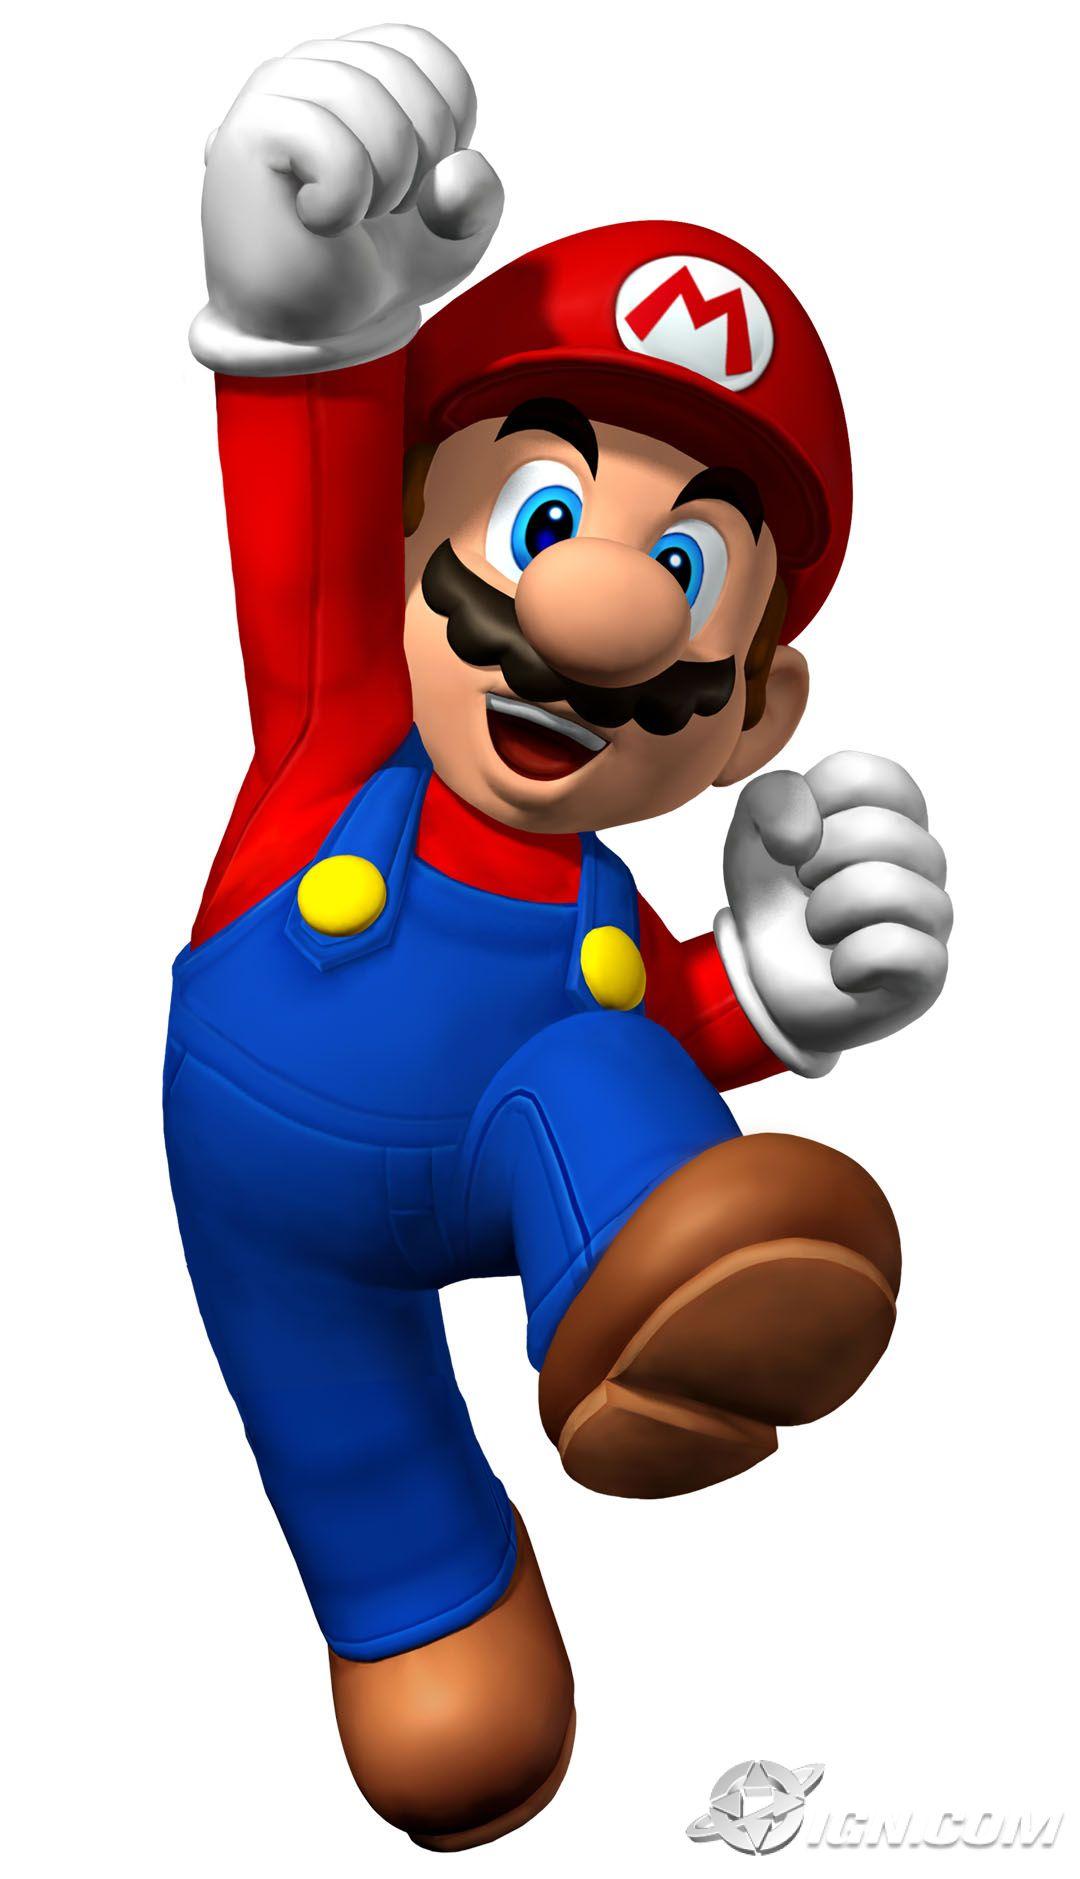 So, I Finally Got a Wii…